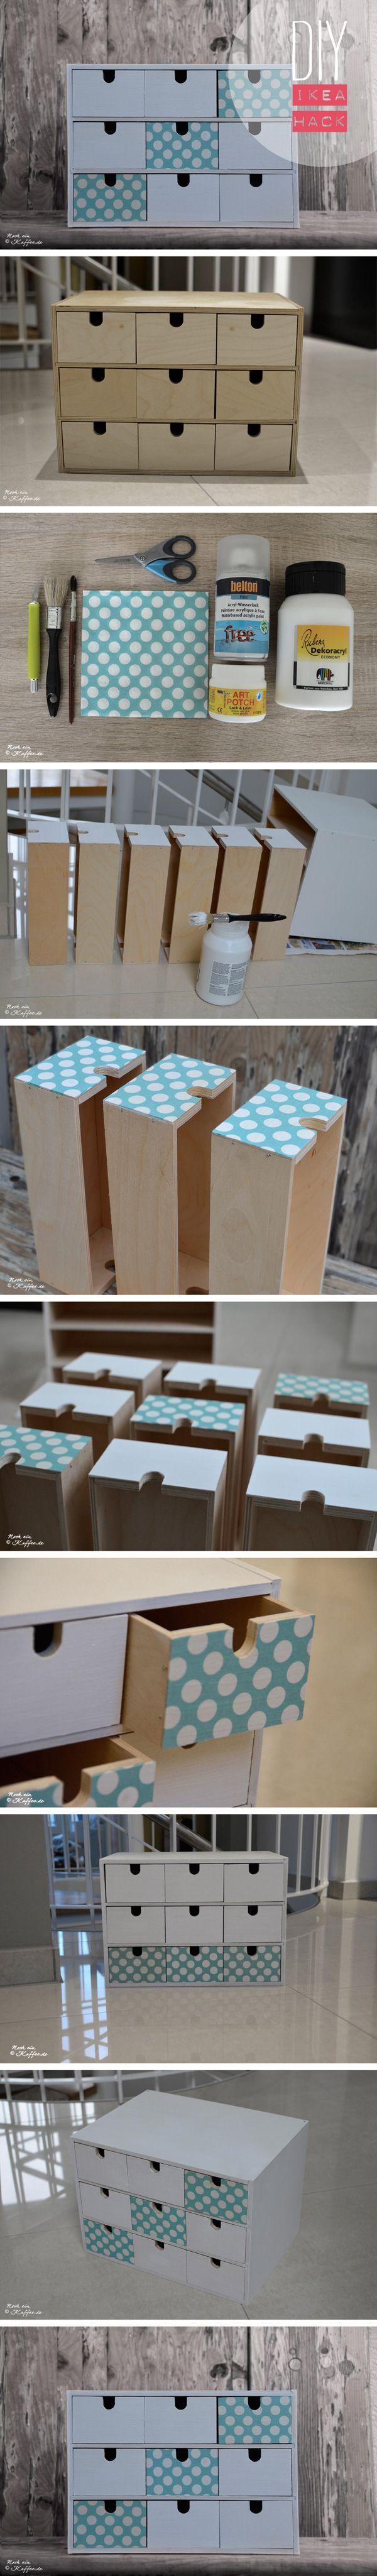 DIY Ikea Hack: Fira Minikommode IKEA HACK: EIN NEUER PLATZ ...